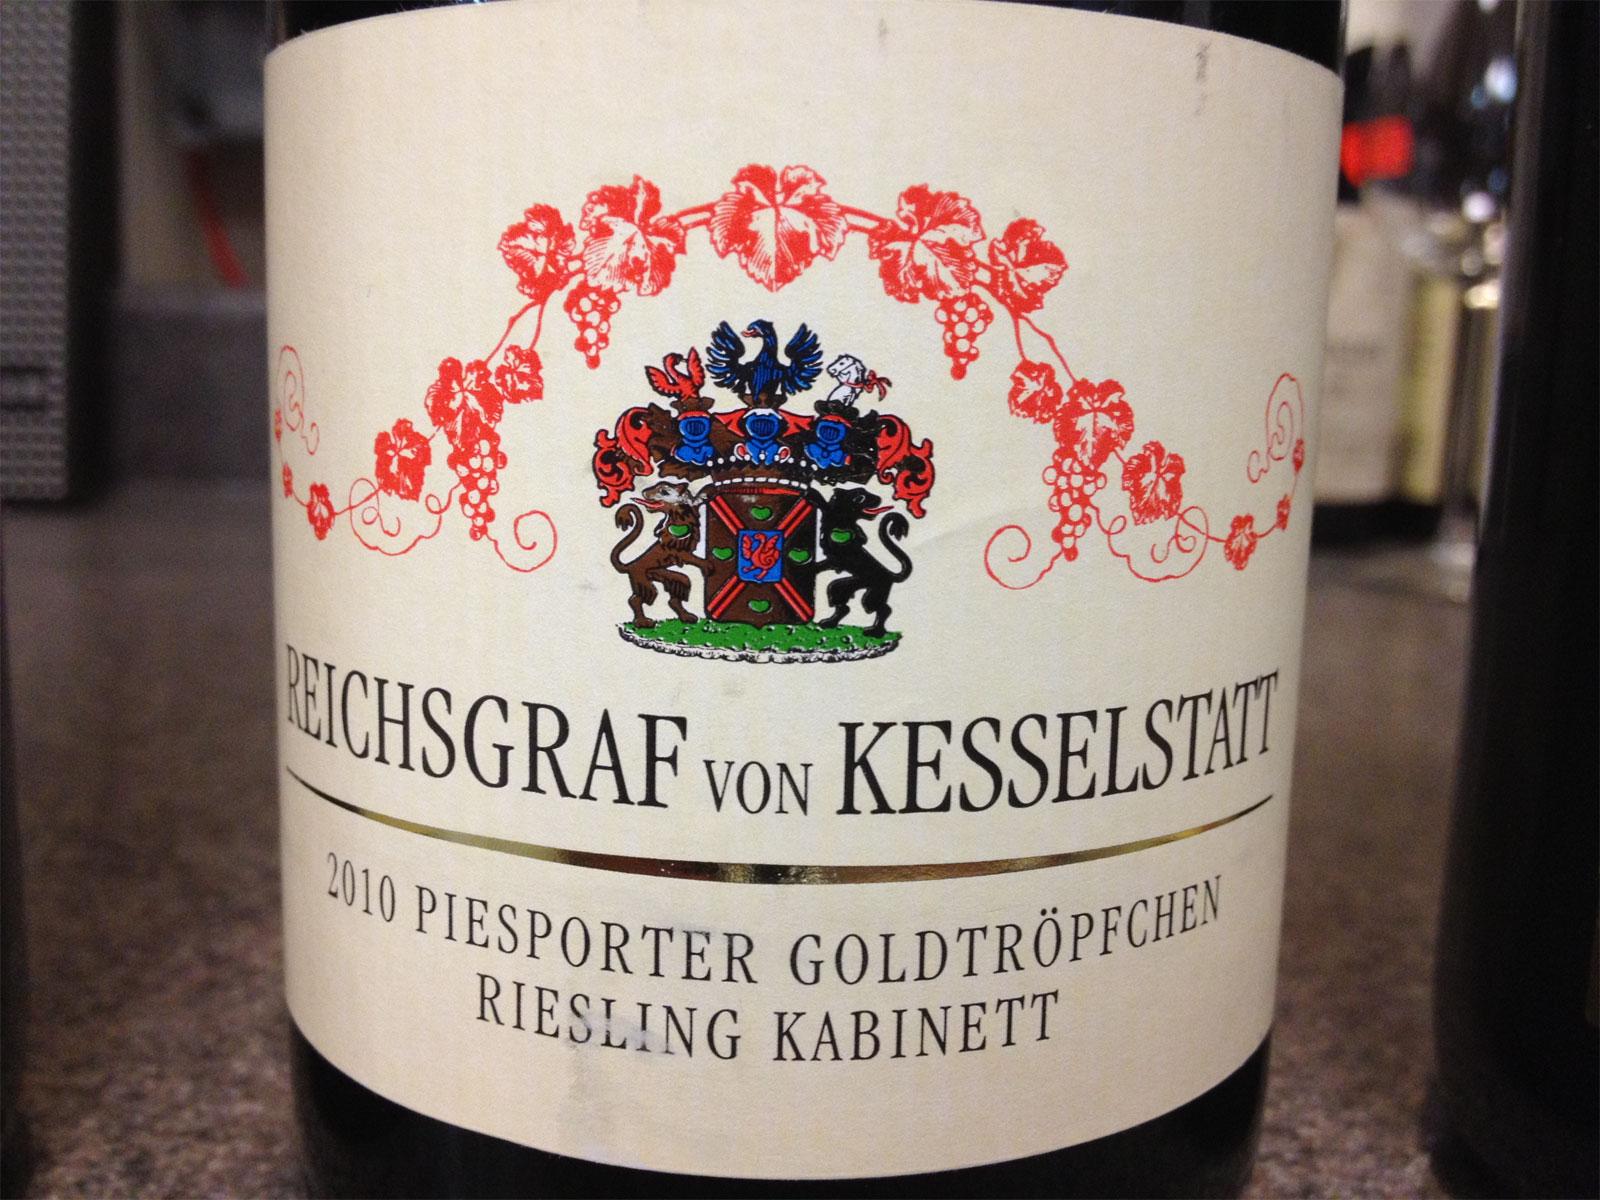 Tasting the wines of Reichsgraf von Kesselstatt | Hogshead - A ...